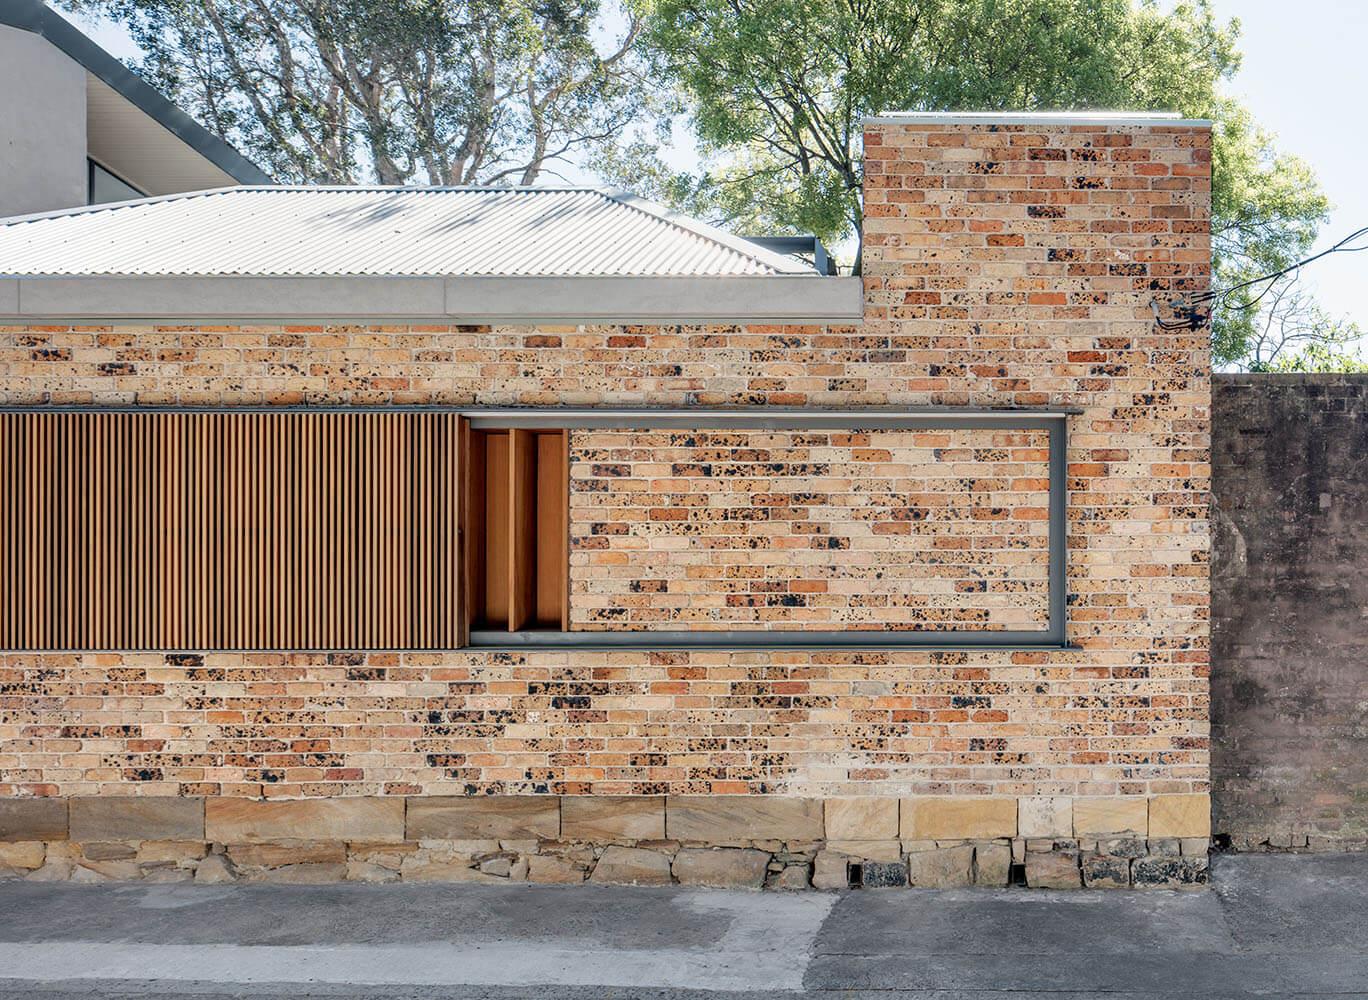 bolt hole by PanovScott. Architectural Photography Murray Fredericks facade